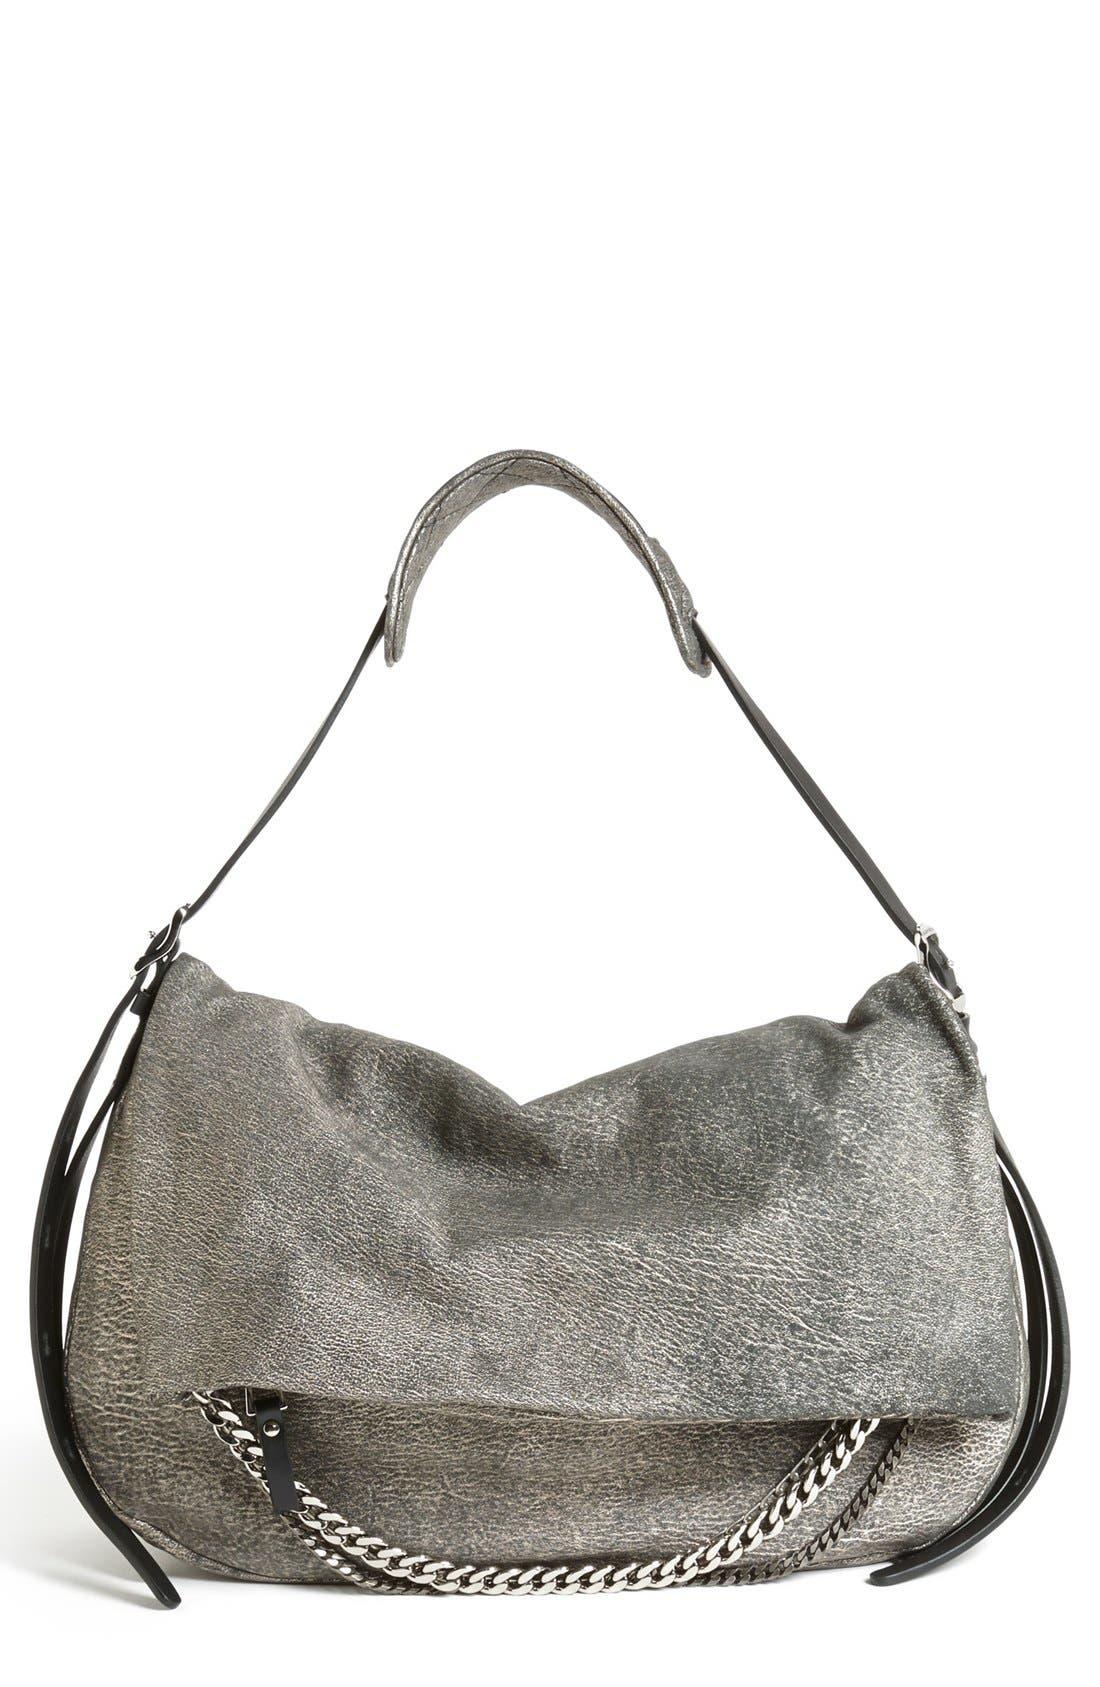 Main Image - Jimmy Choo 'Biker - Large' Metallic Suede Shoulder Bag